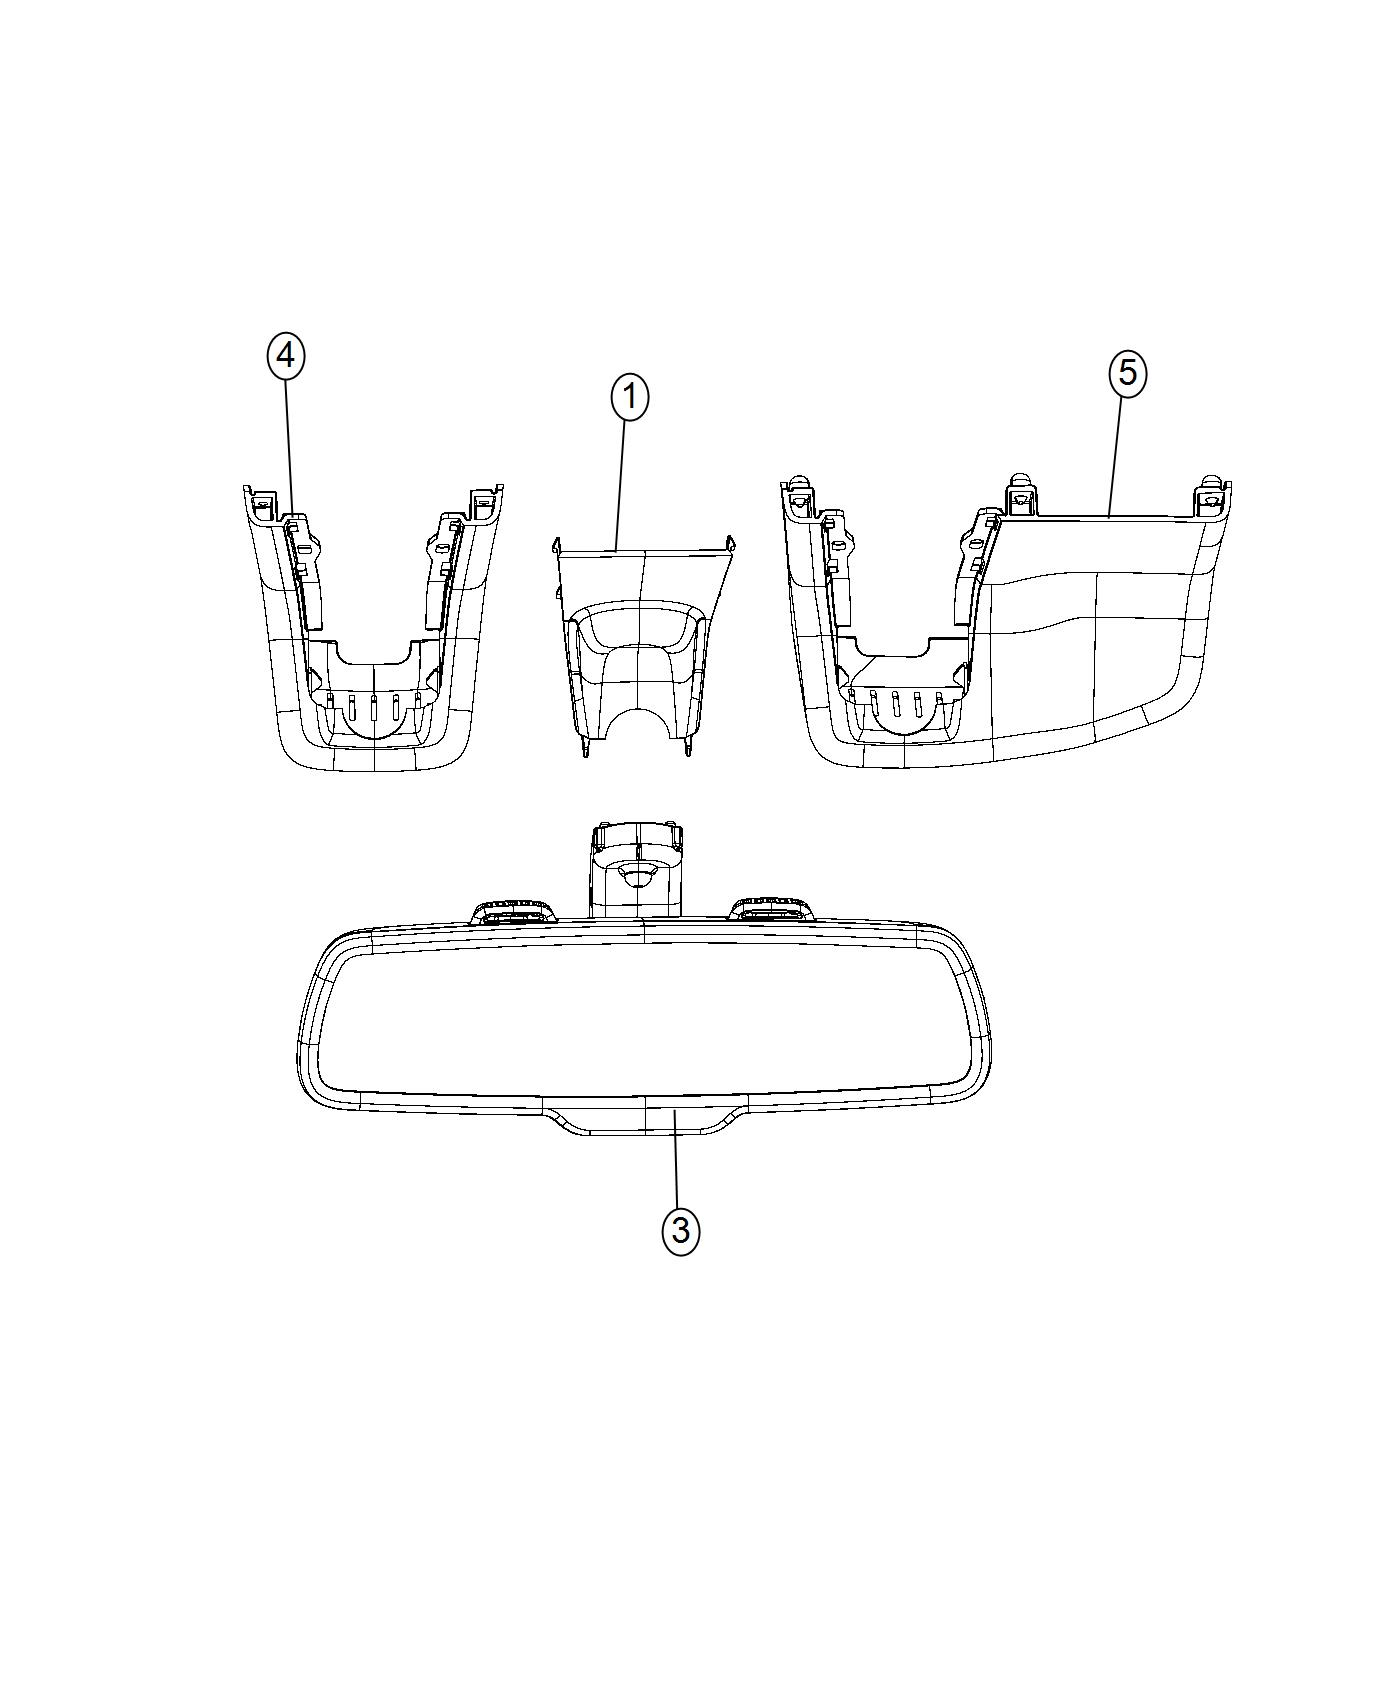 Chrysler 300 Mirror. Inside rear view. [rr view auto dim